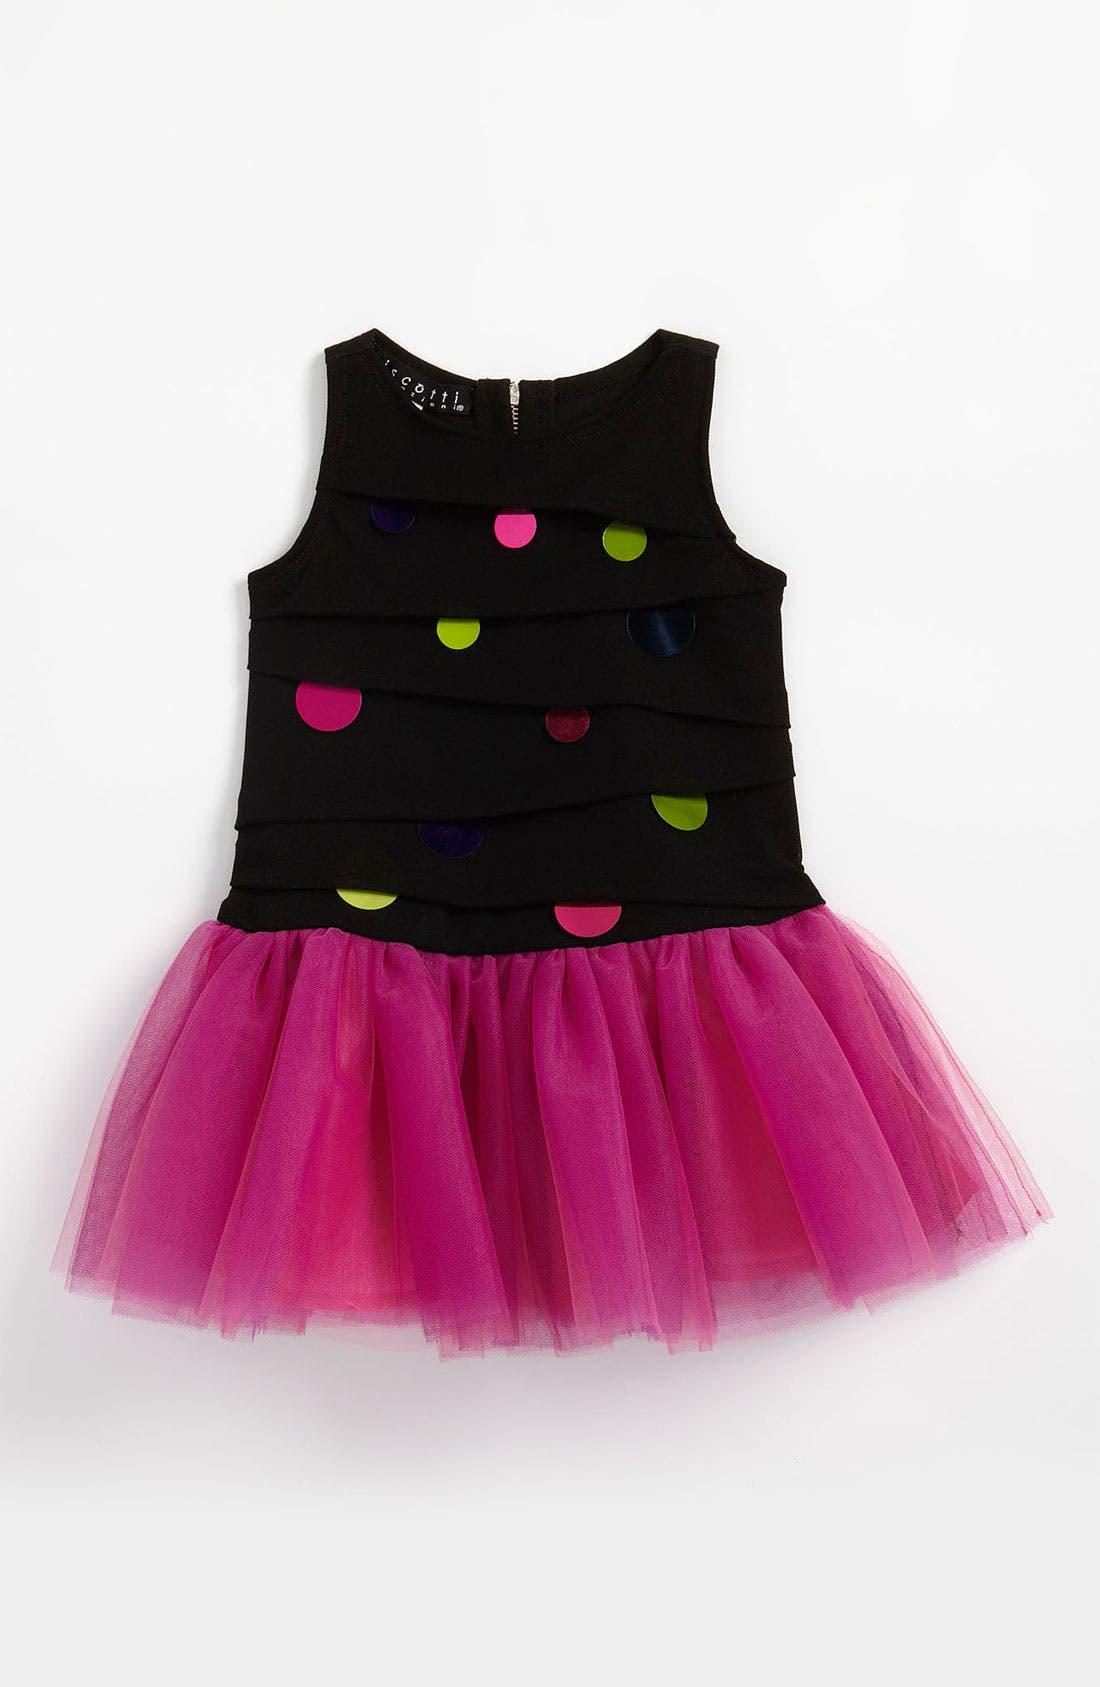 Alternate Image 1 Selected - Biscotti 'Ballerina' Dress (Toddler)